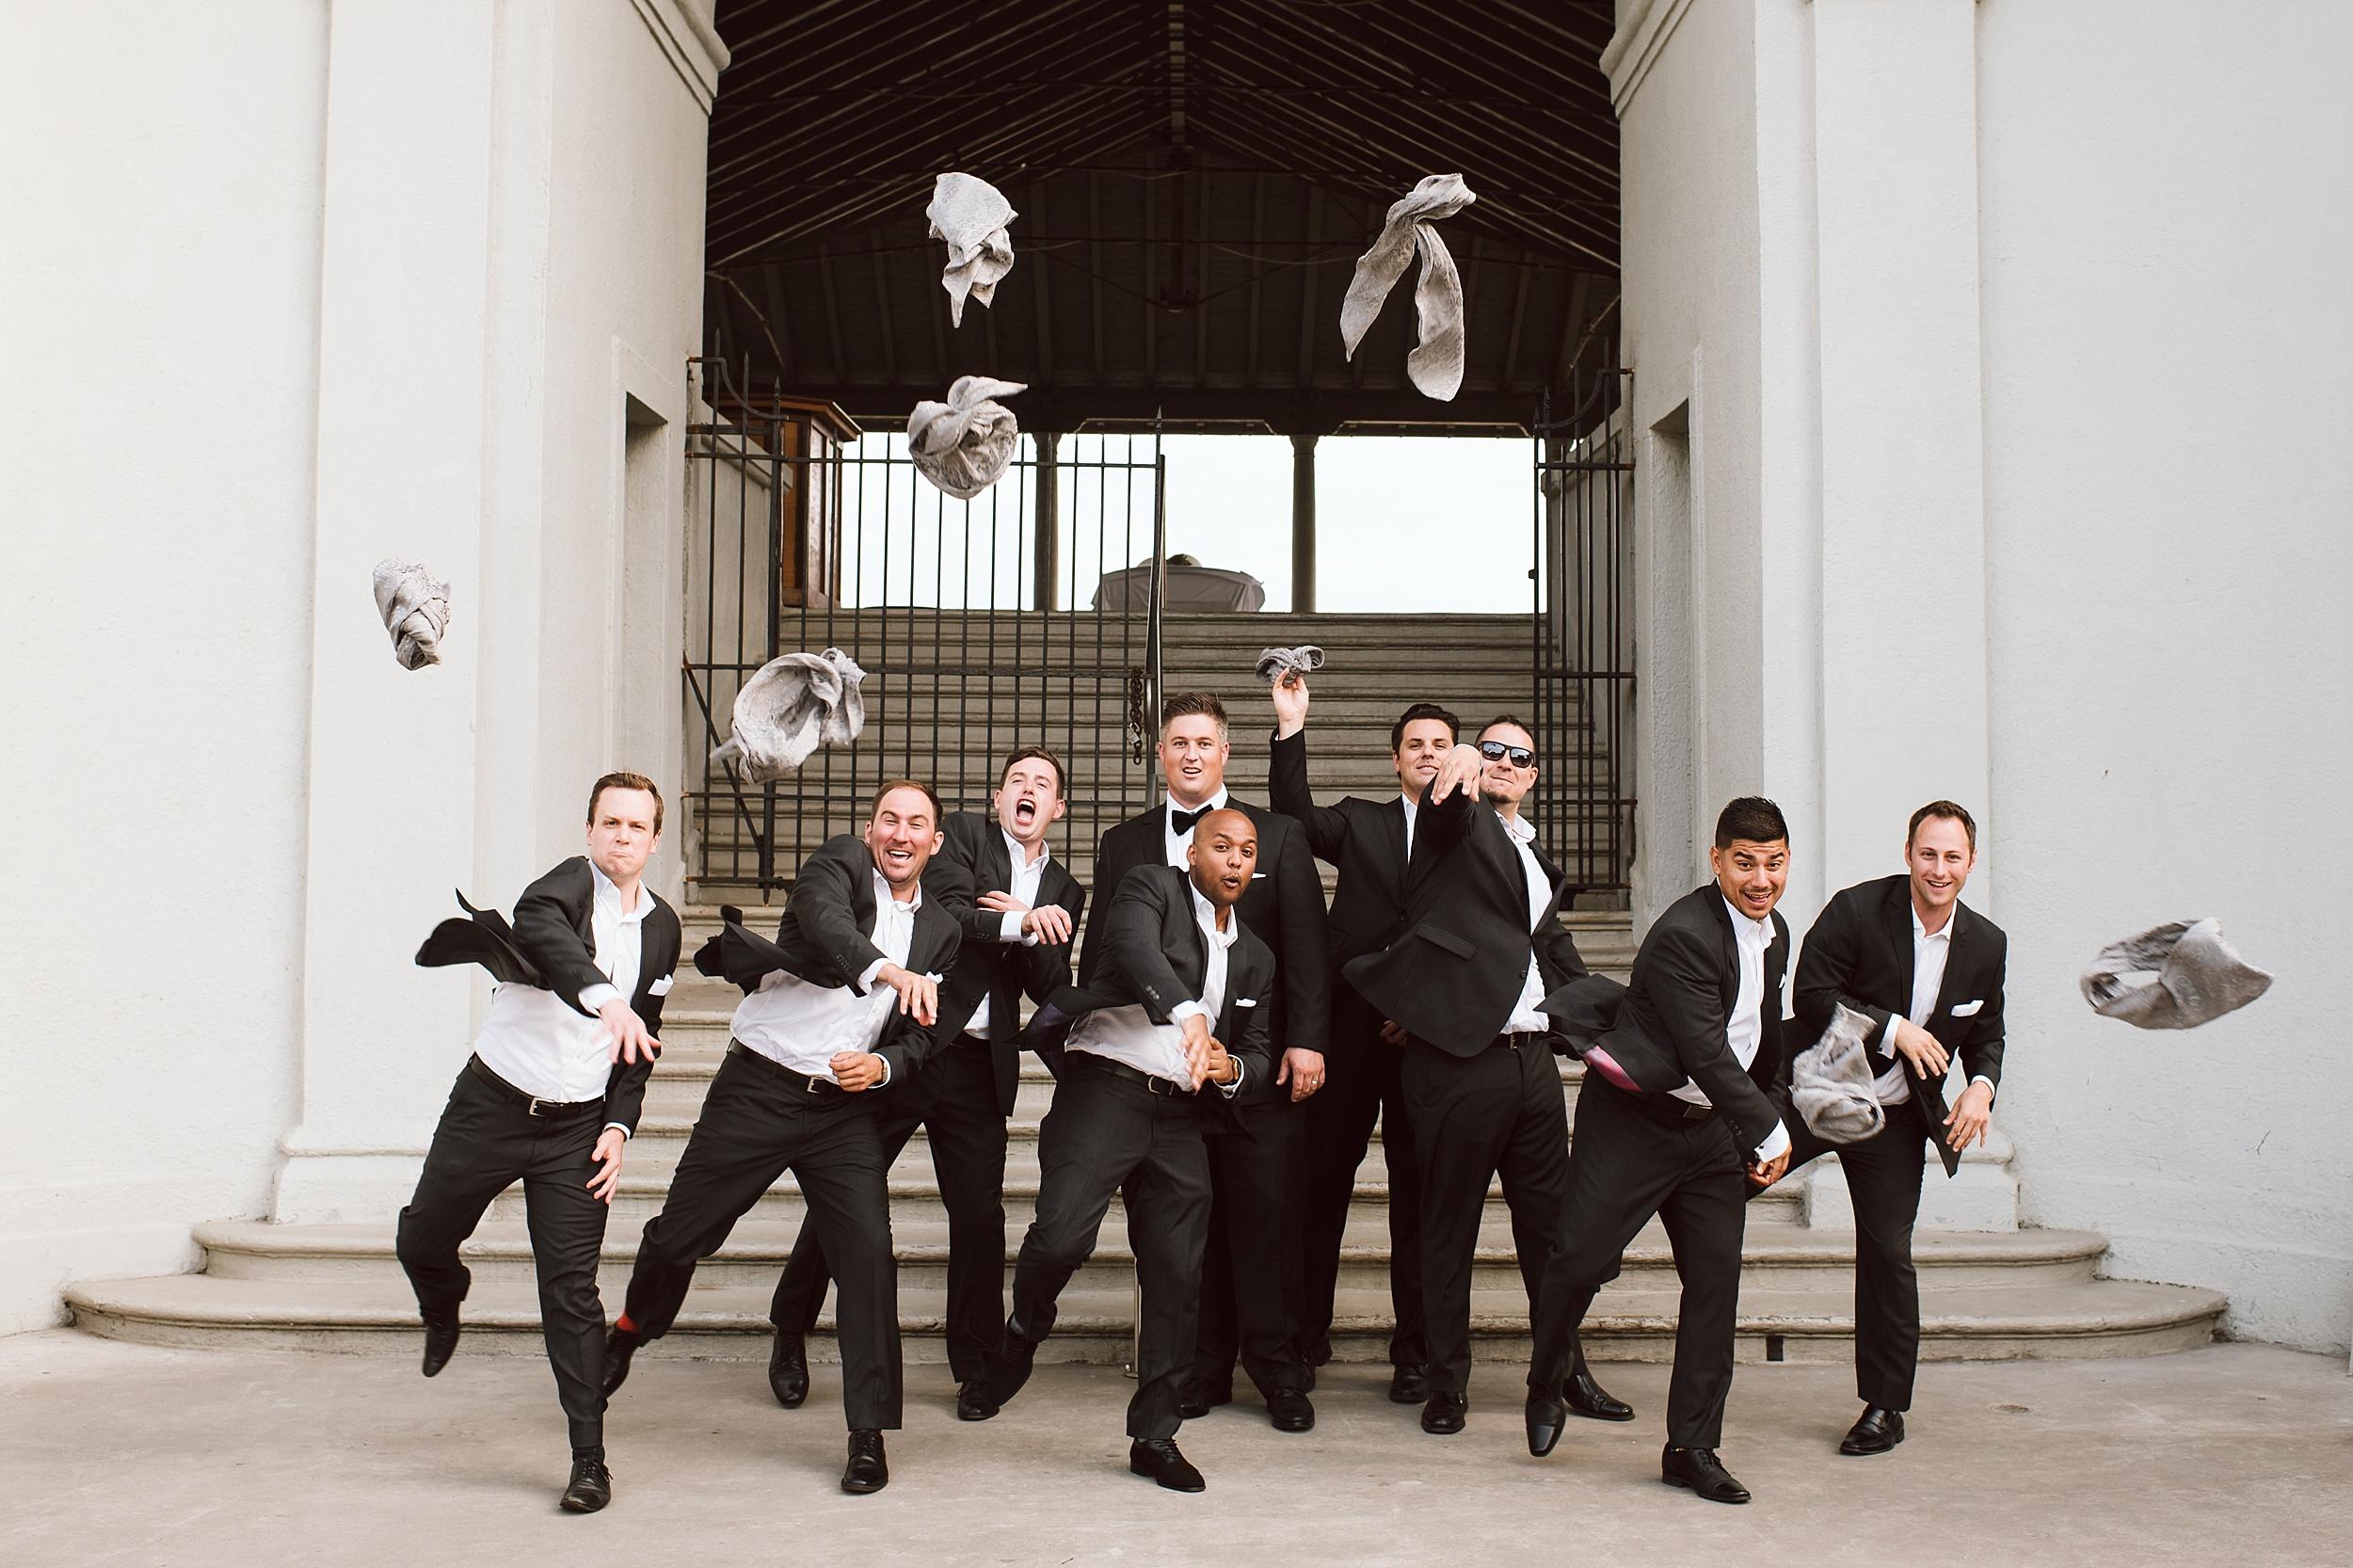 Sunnyside_Pavilion_Wedding_Toronto_Photographer_0092.jpg